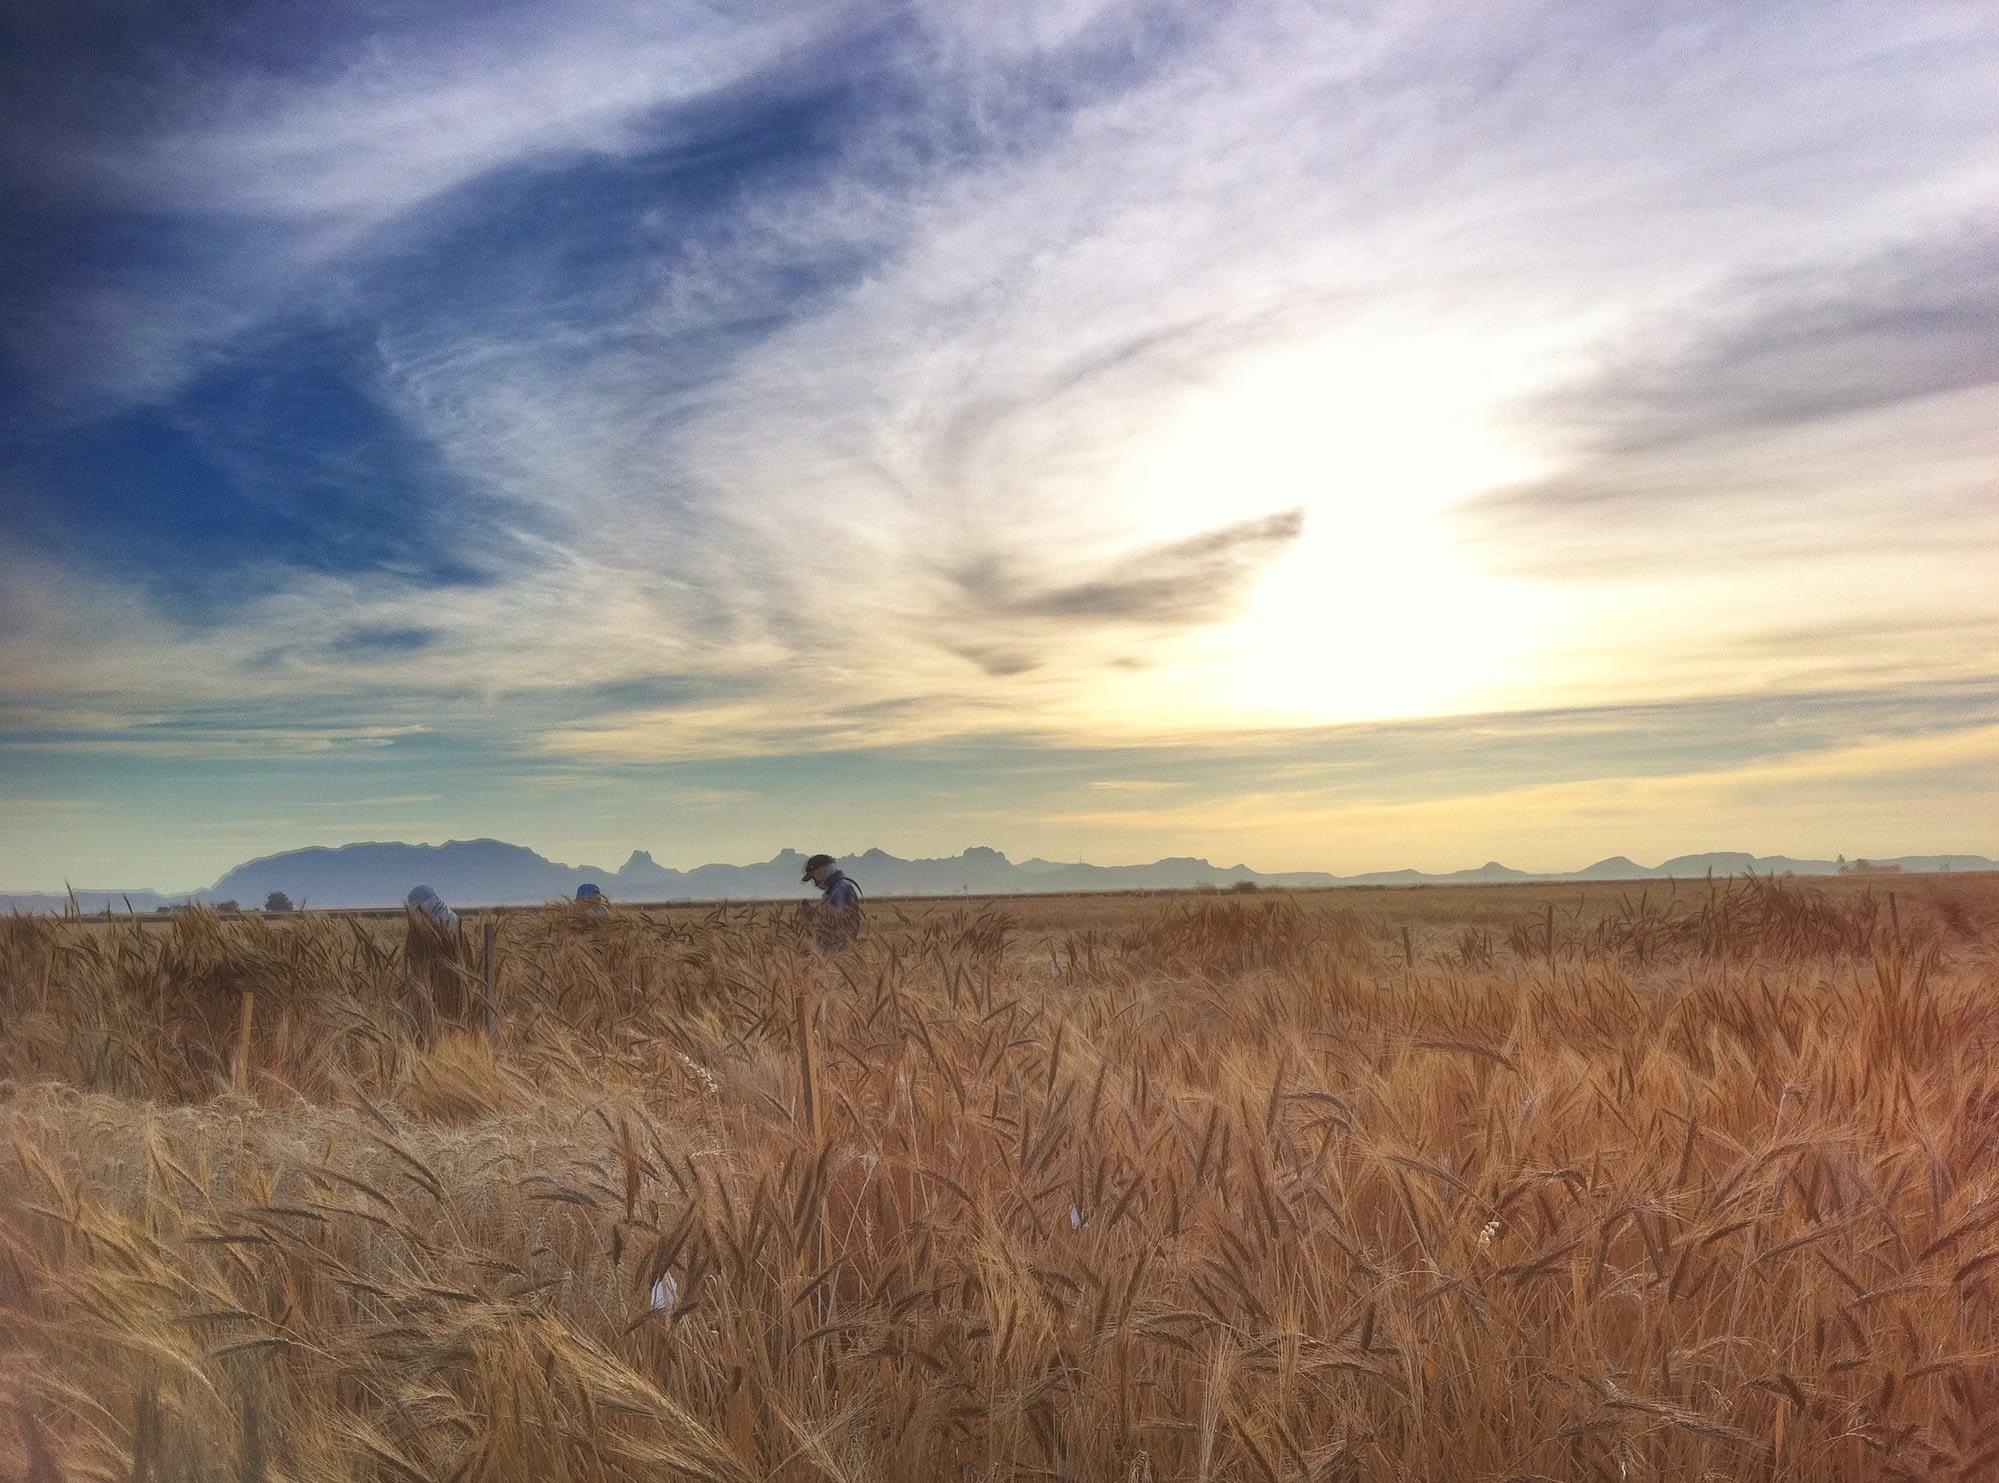 Wheat fields at CIMMYT's experimental station near Ciudad Obregón, Sonora, Mexico. (Photo: M. Ellis/CIMMYT)